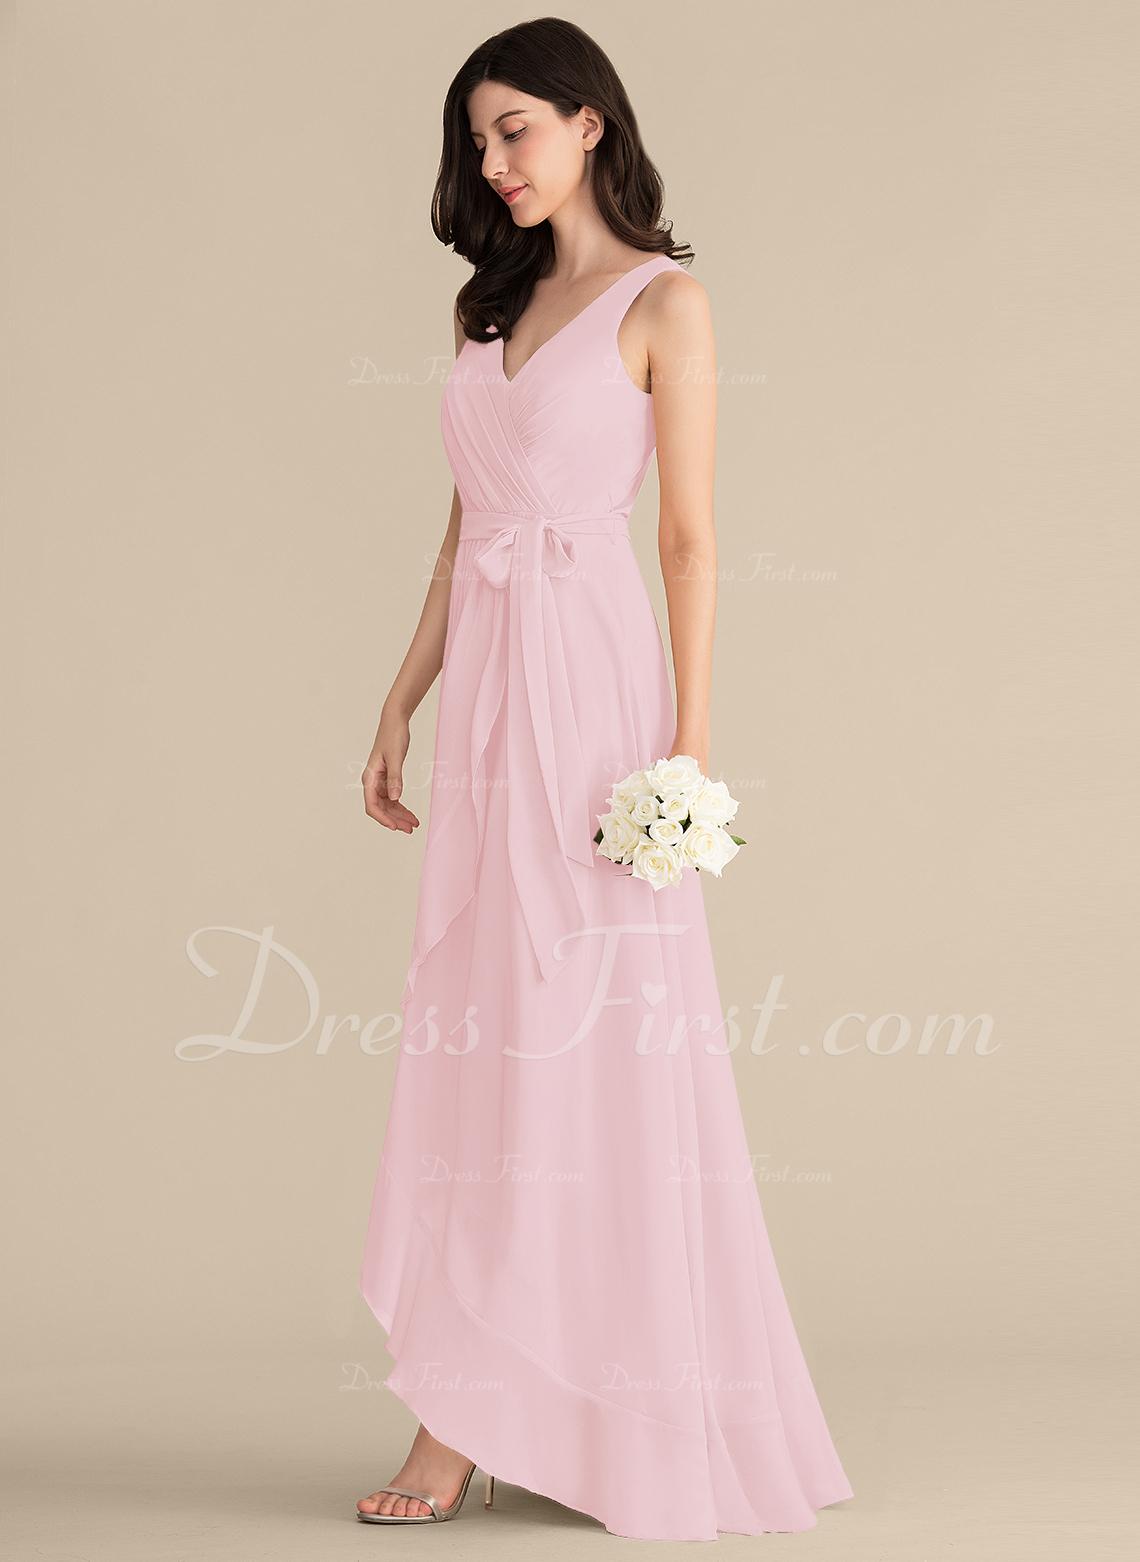 c8318e7059 Loading zoom. Loading. A-Line Princess V-neck Asymmetrical Chiffon Prom  Dresses With Ruffle ...